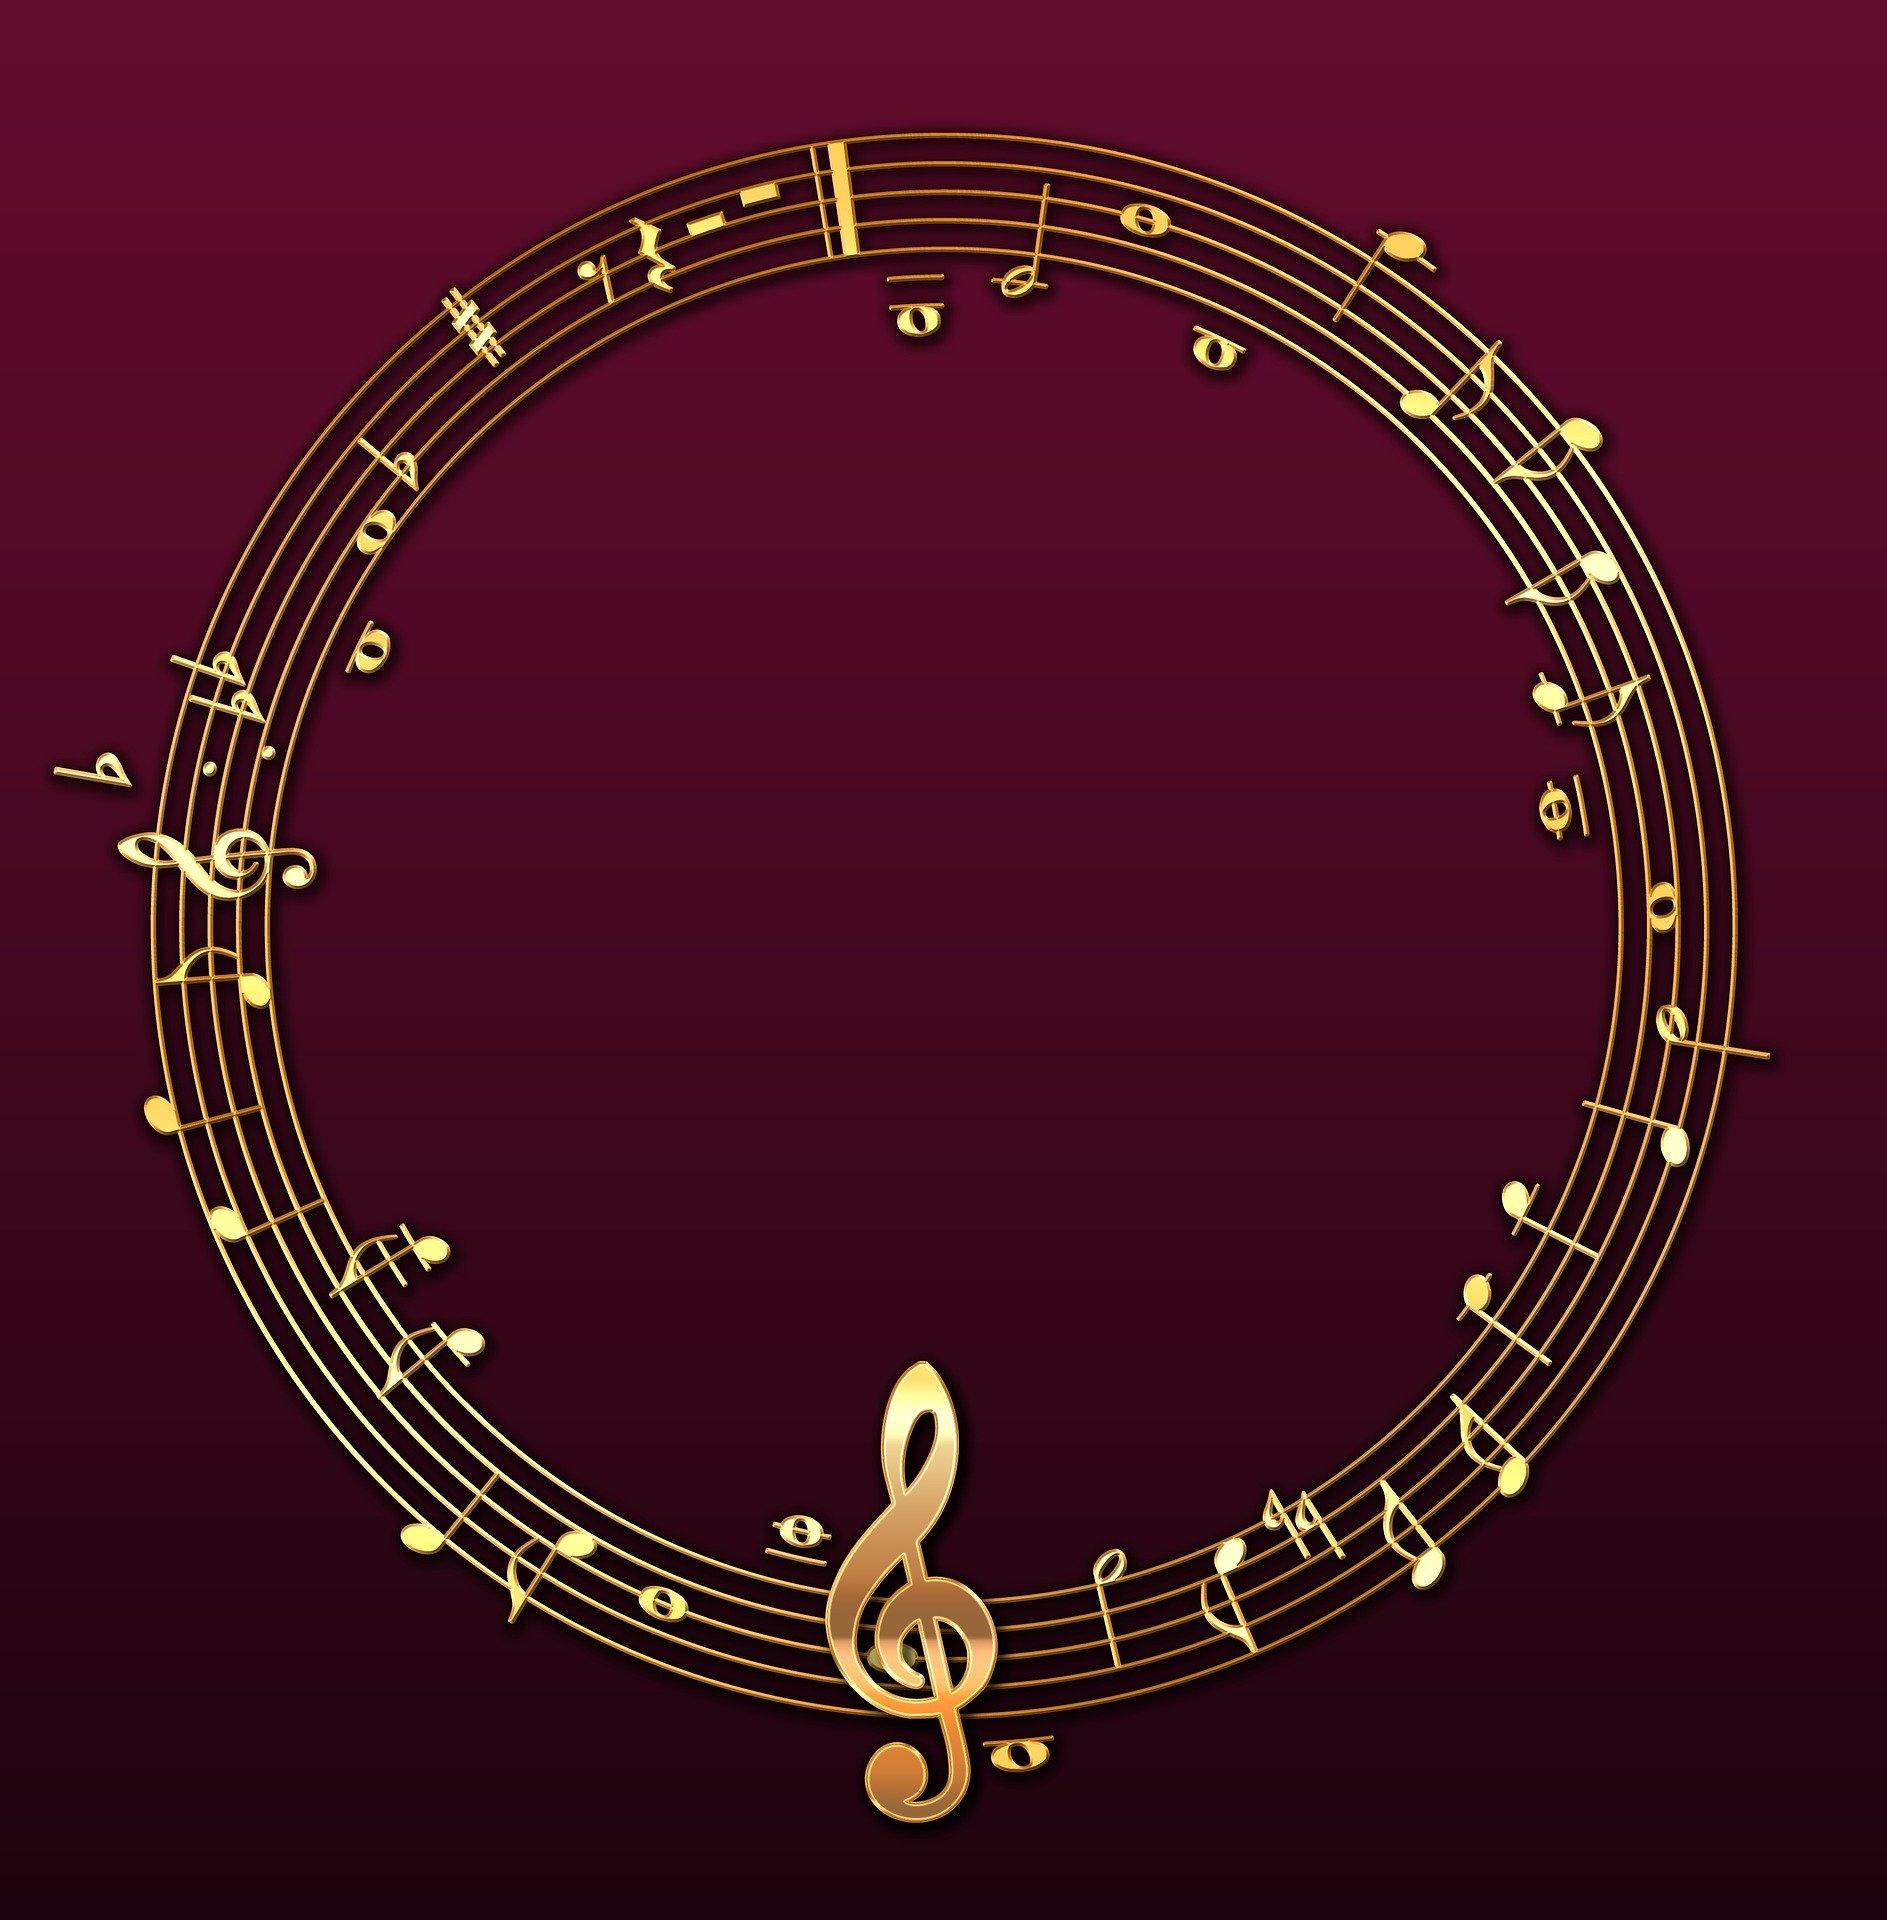 composer-chanson-anglais-musique